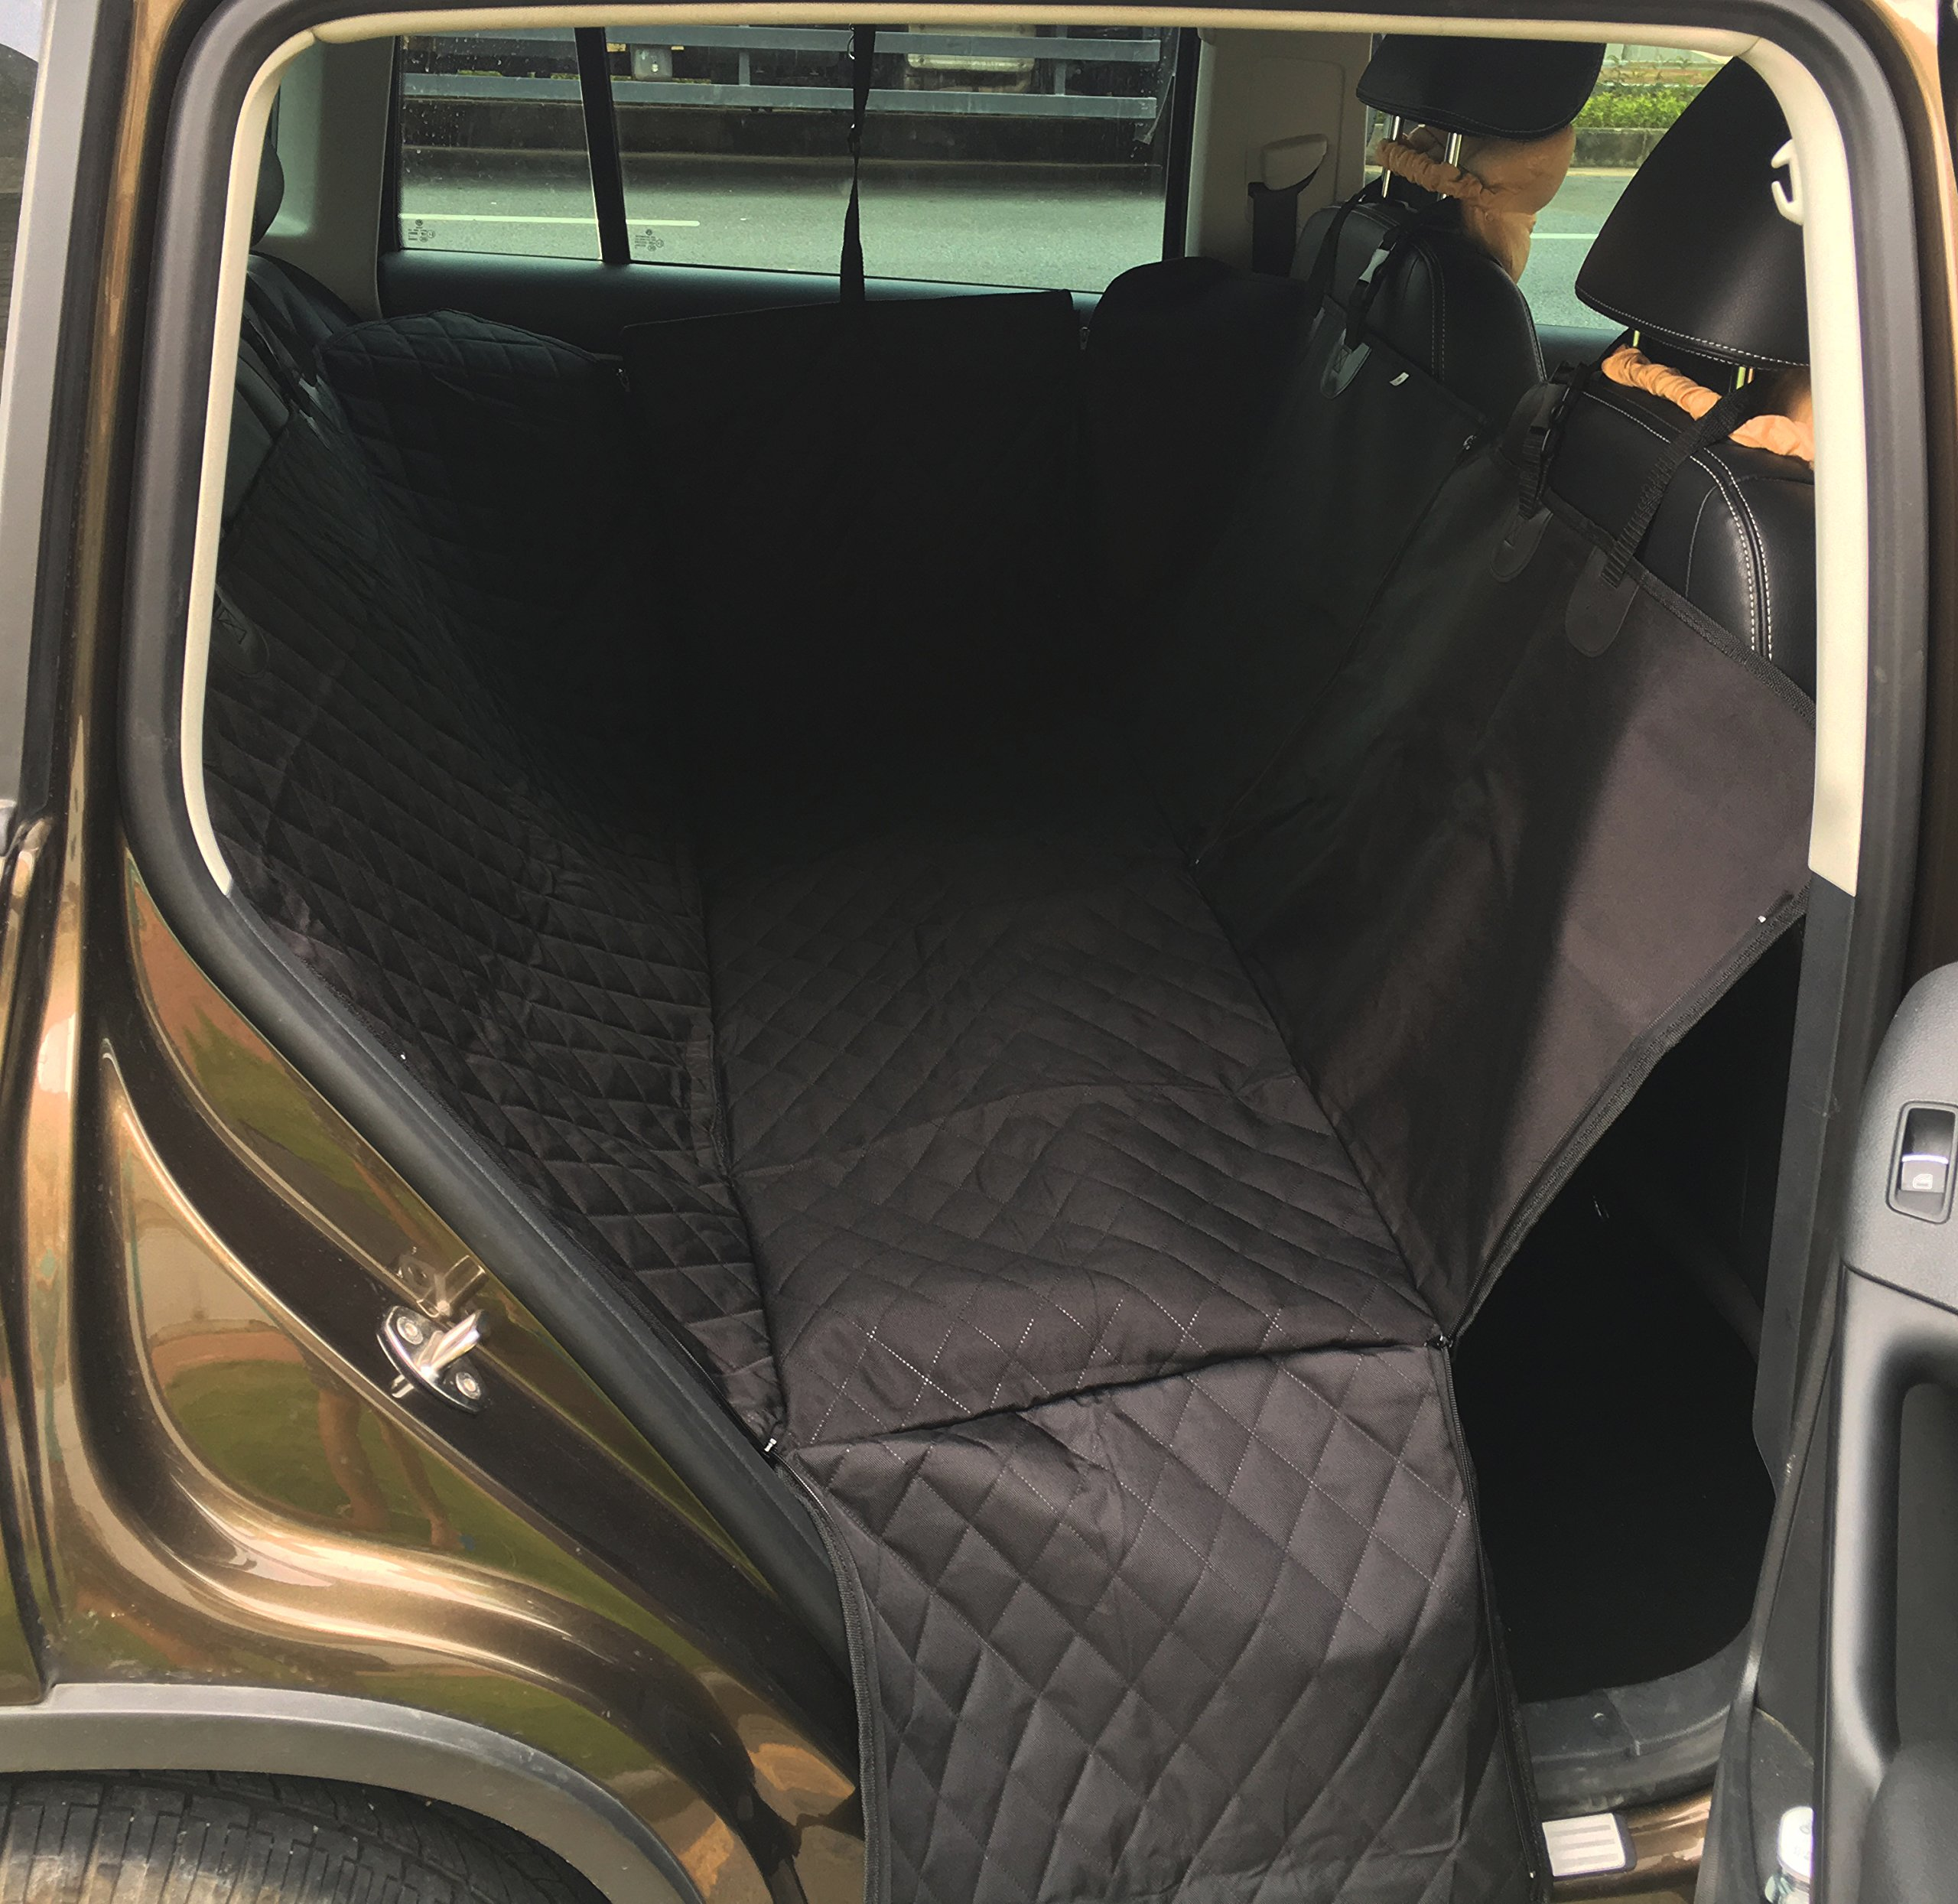 Geepro Waterproof Pet Dog Car Hammock Back Seat Cover Protection Blanket (Enhanced Black)